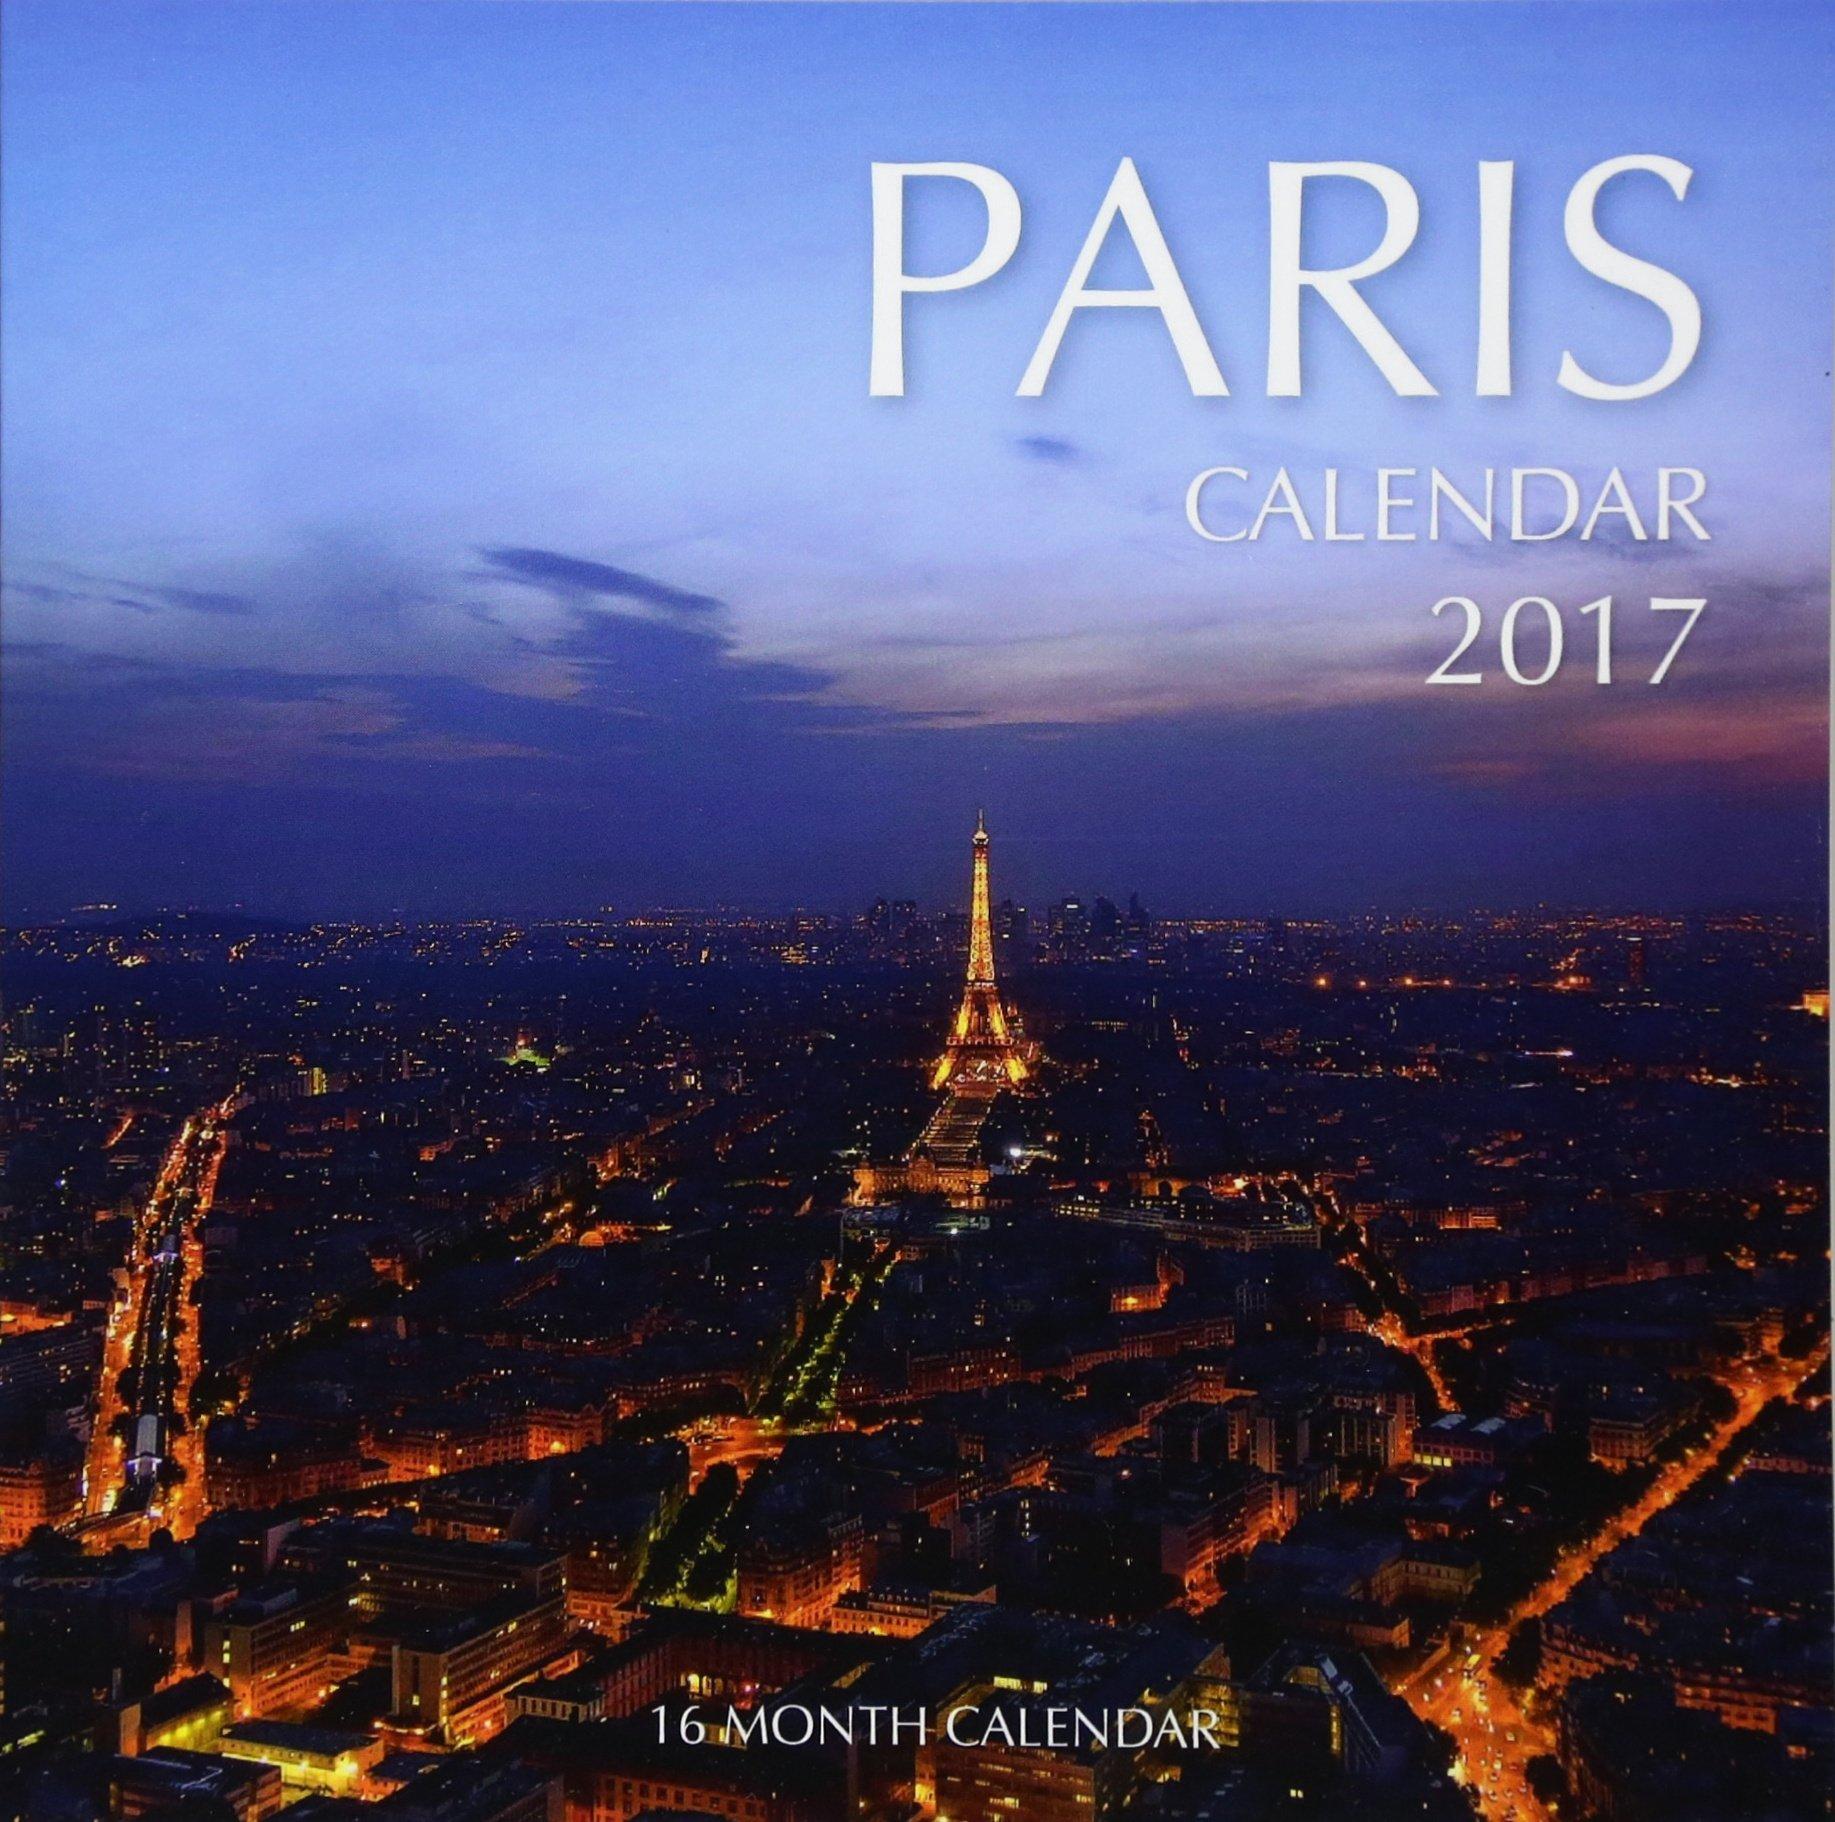 paris calendar 2016 16 month calendar